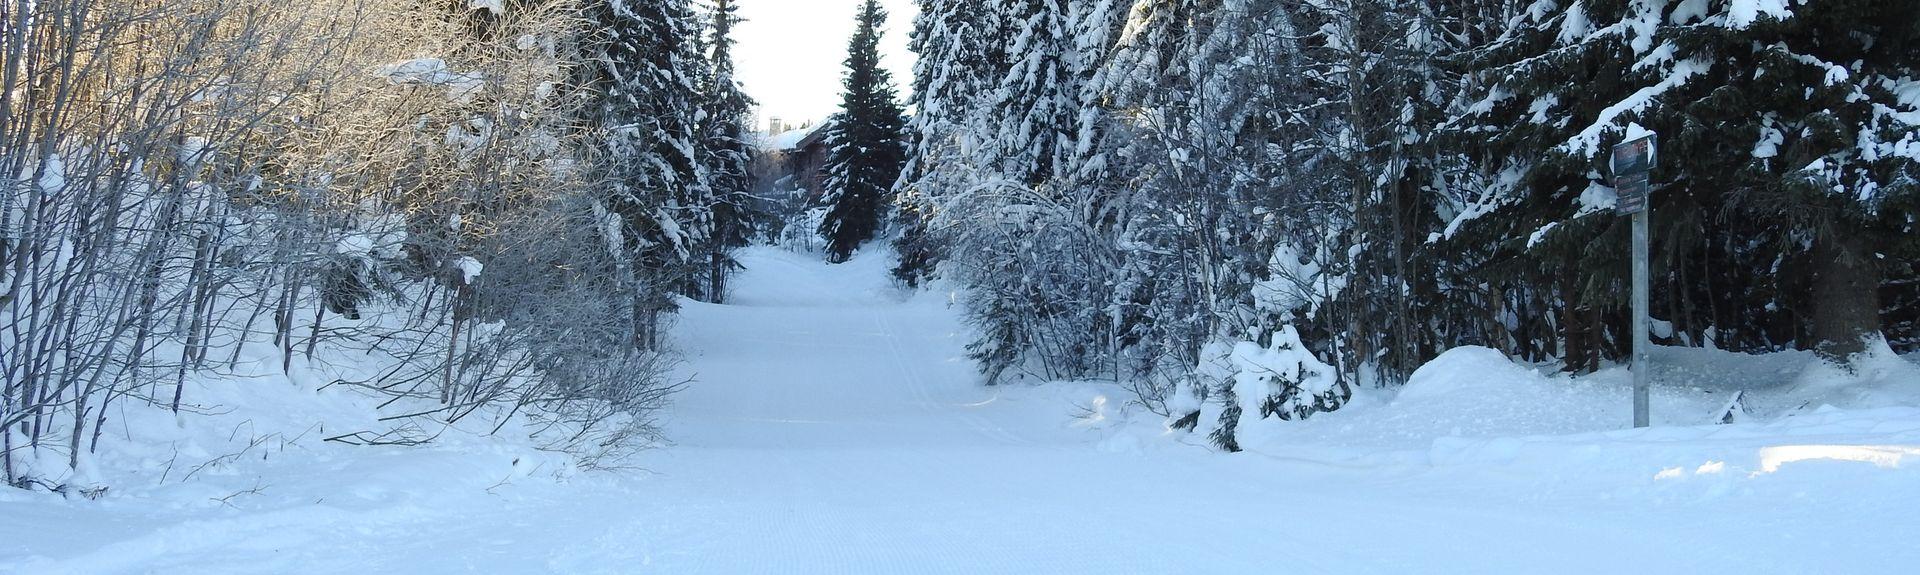 Trysil, Innlandet, Norge